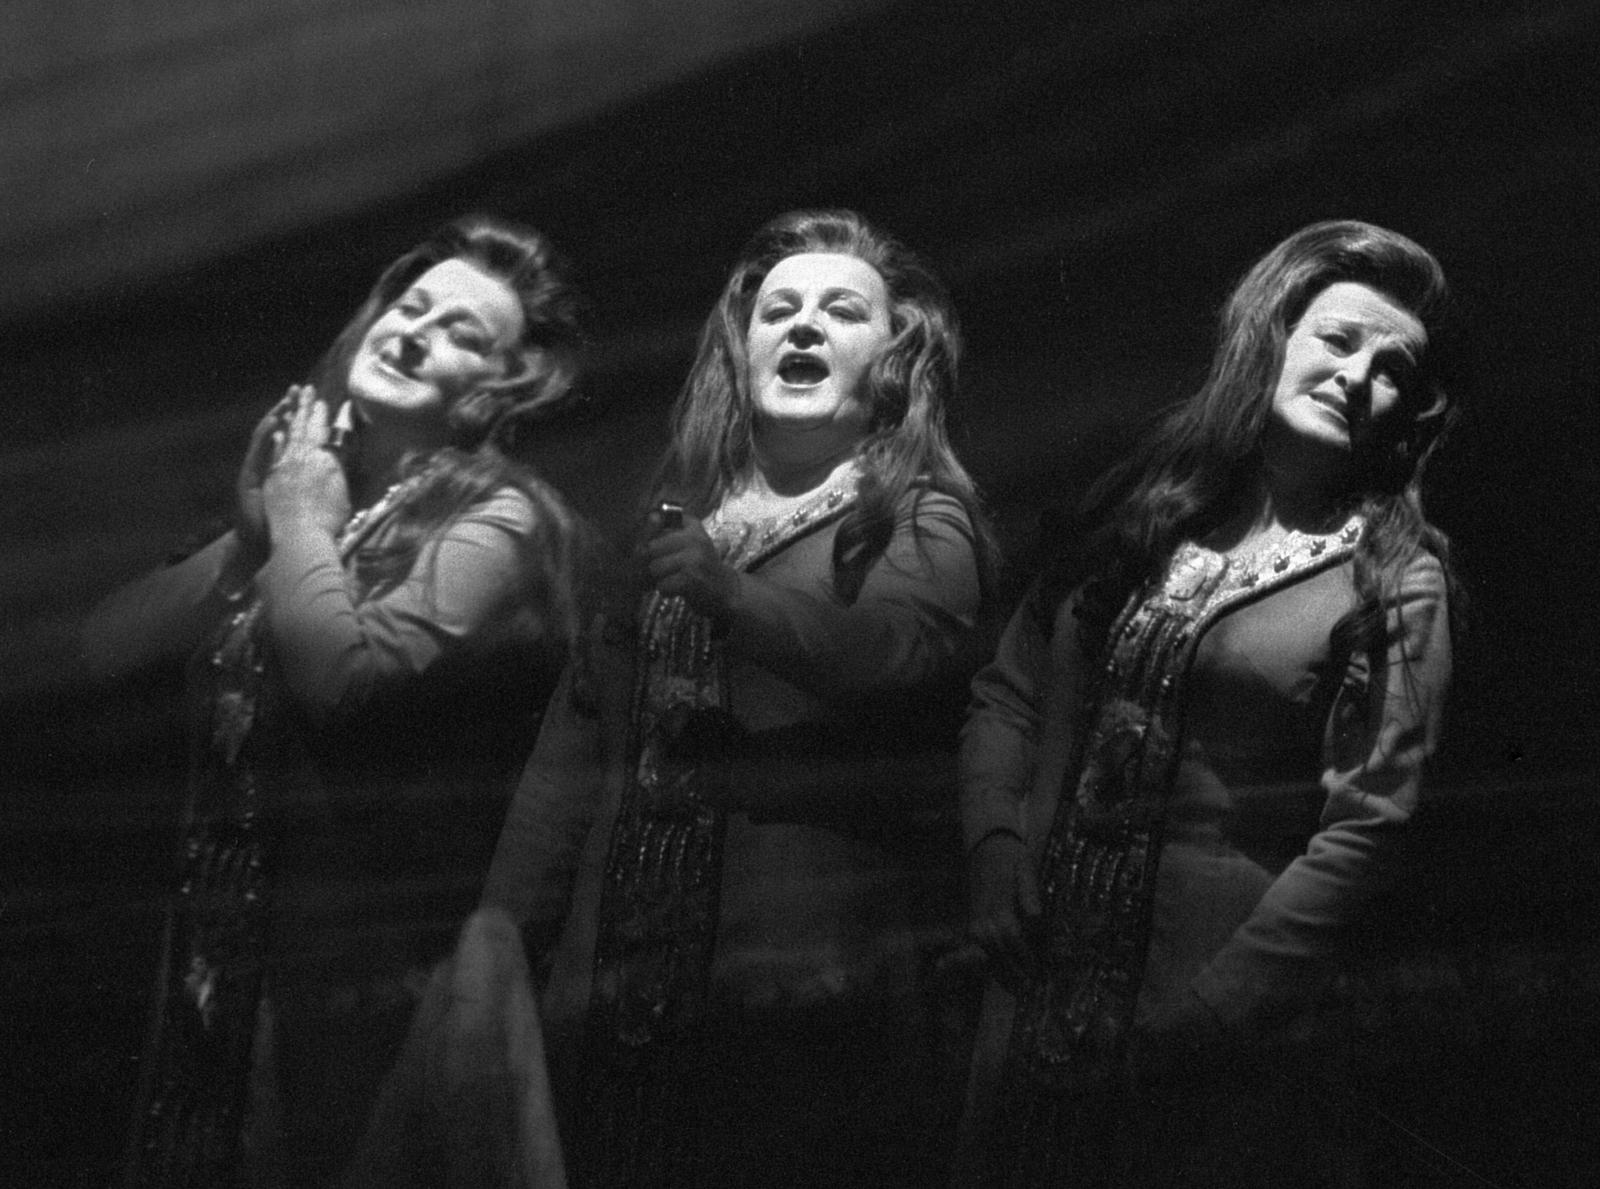 Birgit Nilsson as Brünnhilde in the Metropolitan Opera's production of Richard Wagner's Götterdämmerung, March 1974